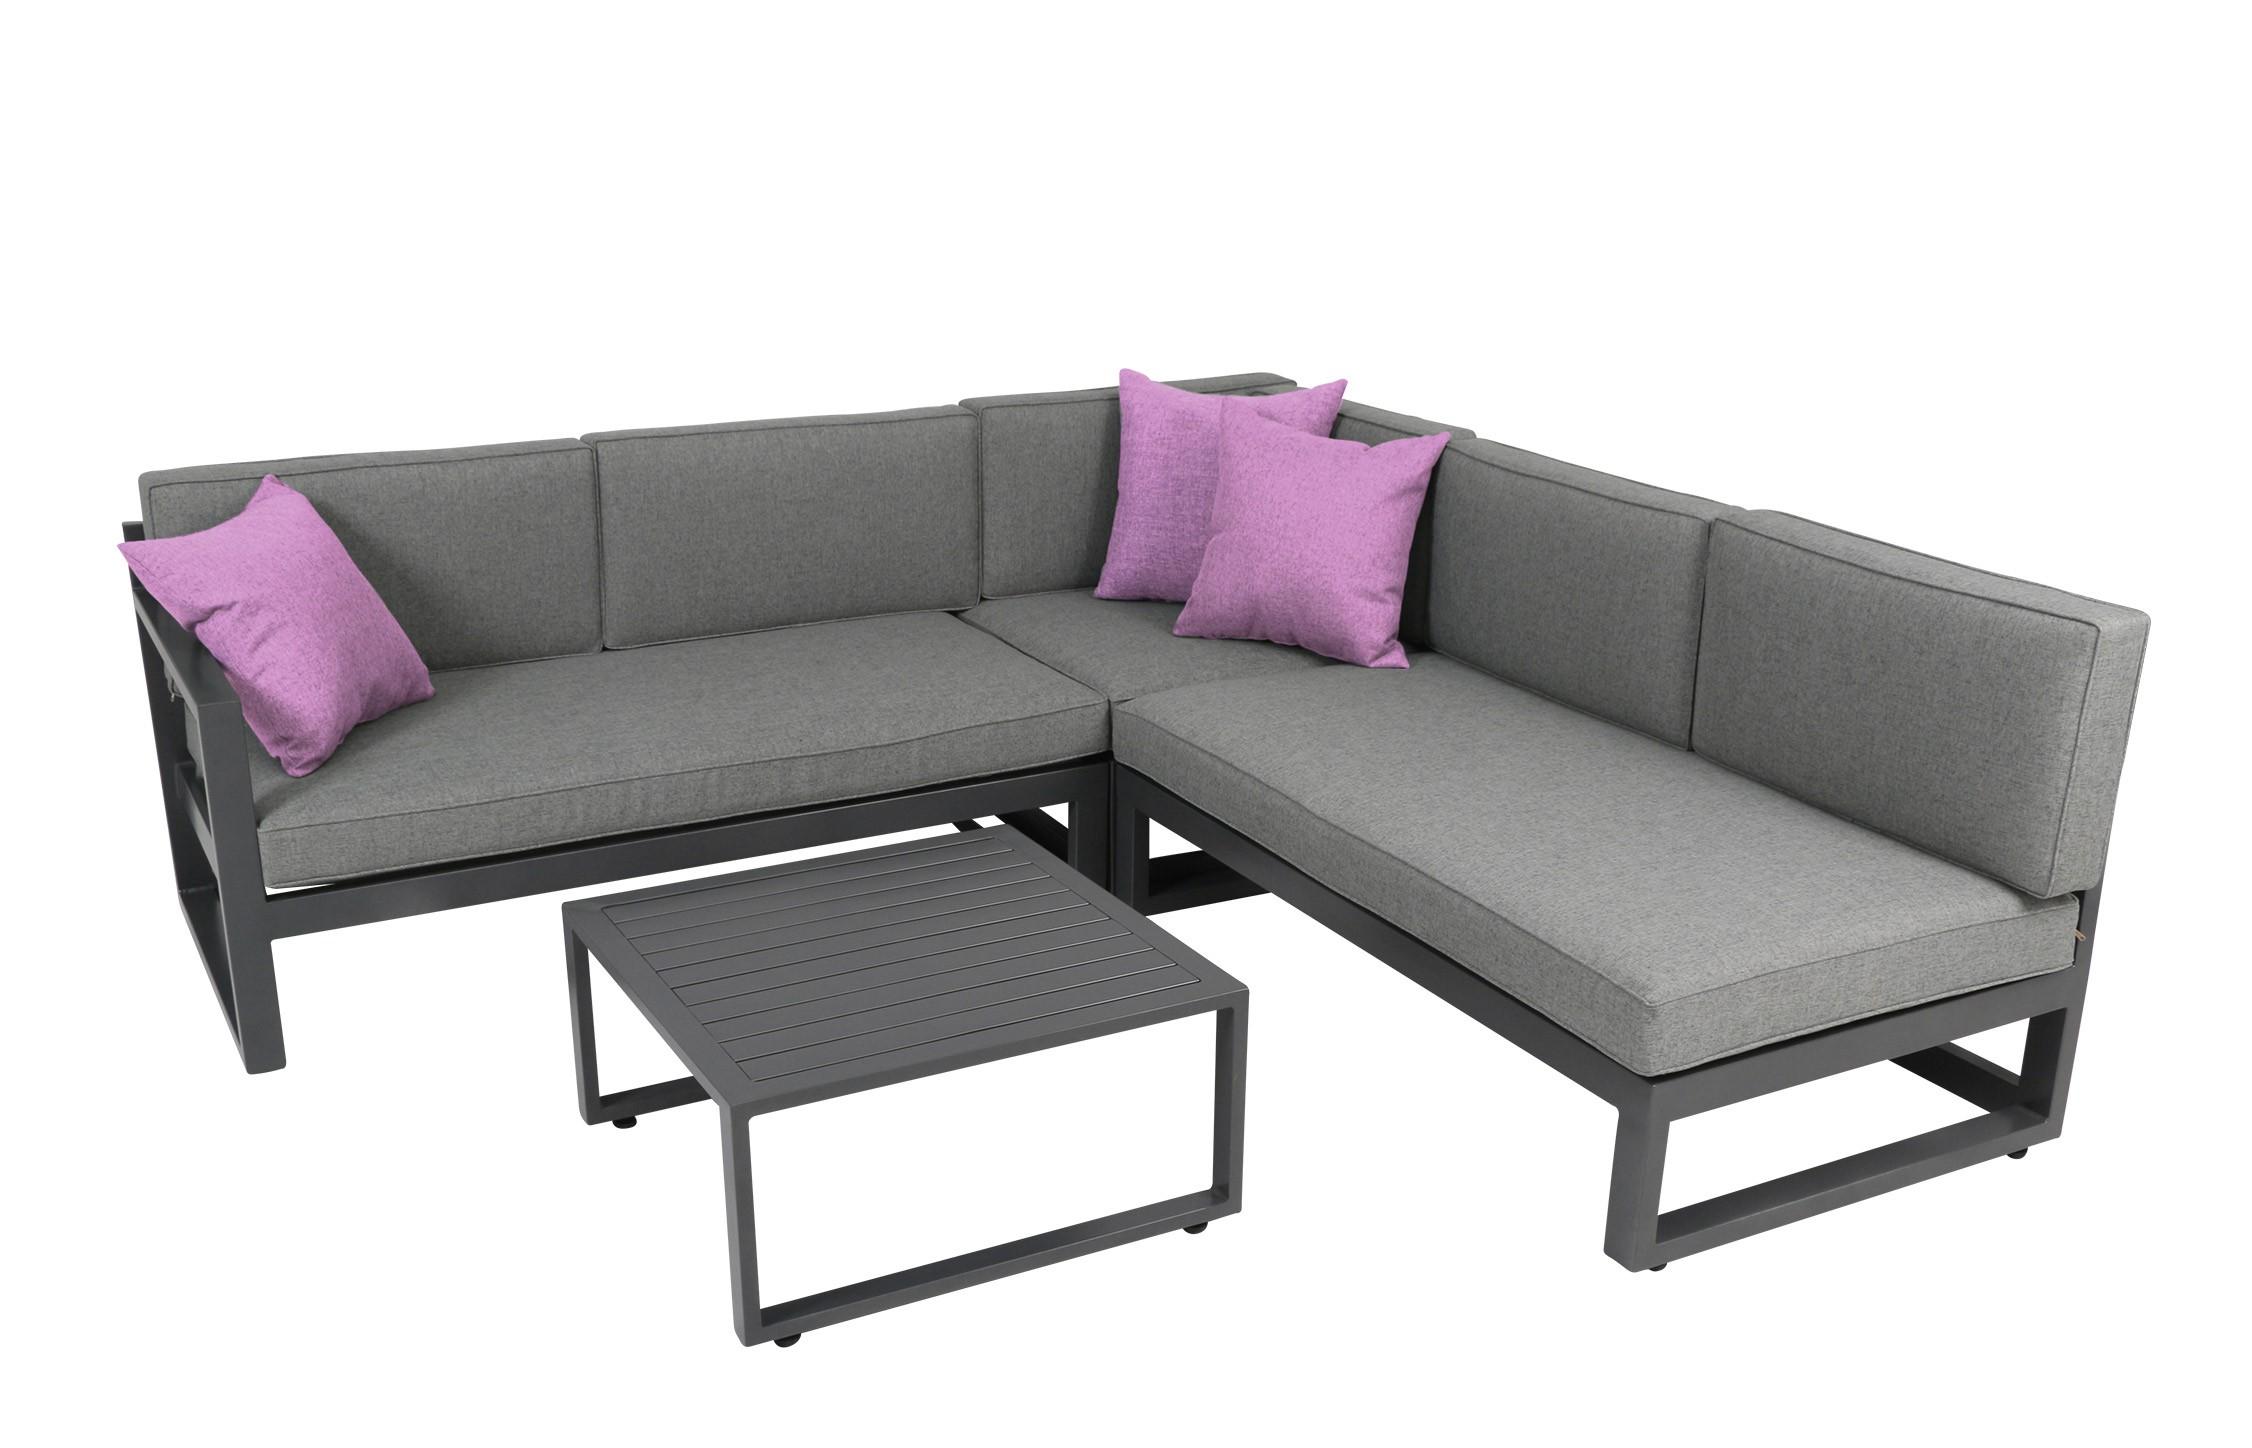 gartenm bel lounge set costa rica greemotion alu grau. Black Bedroom Furniture Sets. Home Design Ideas